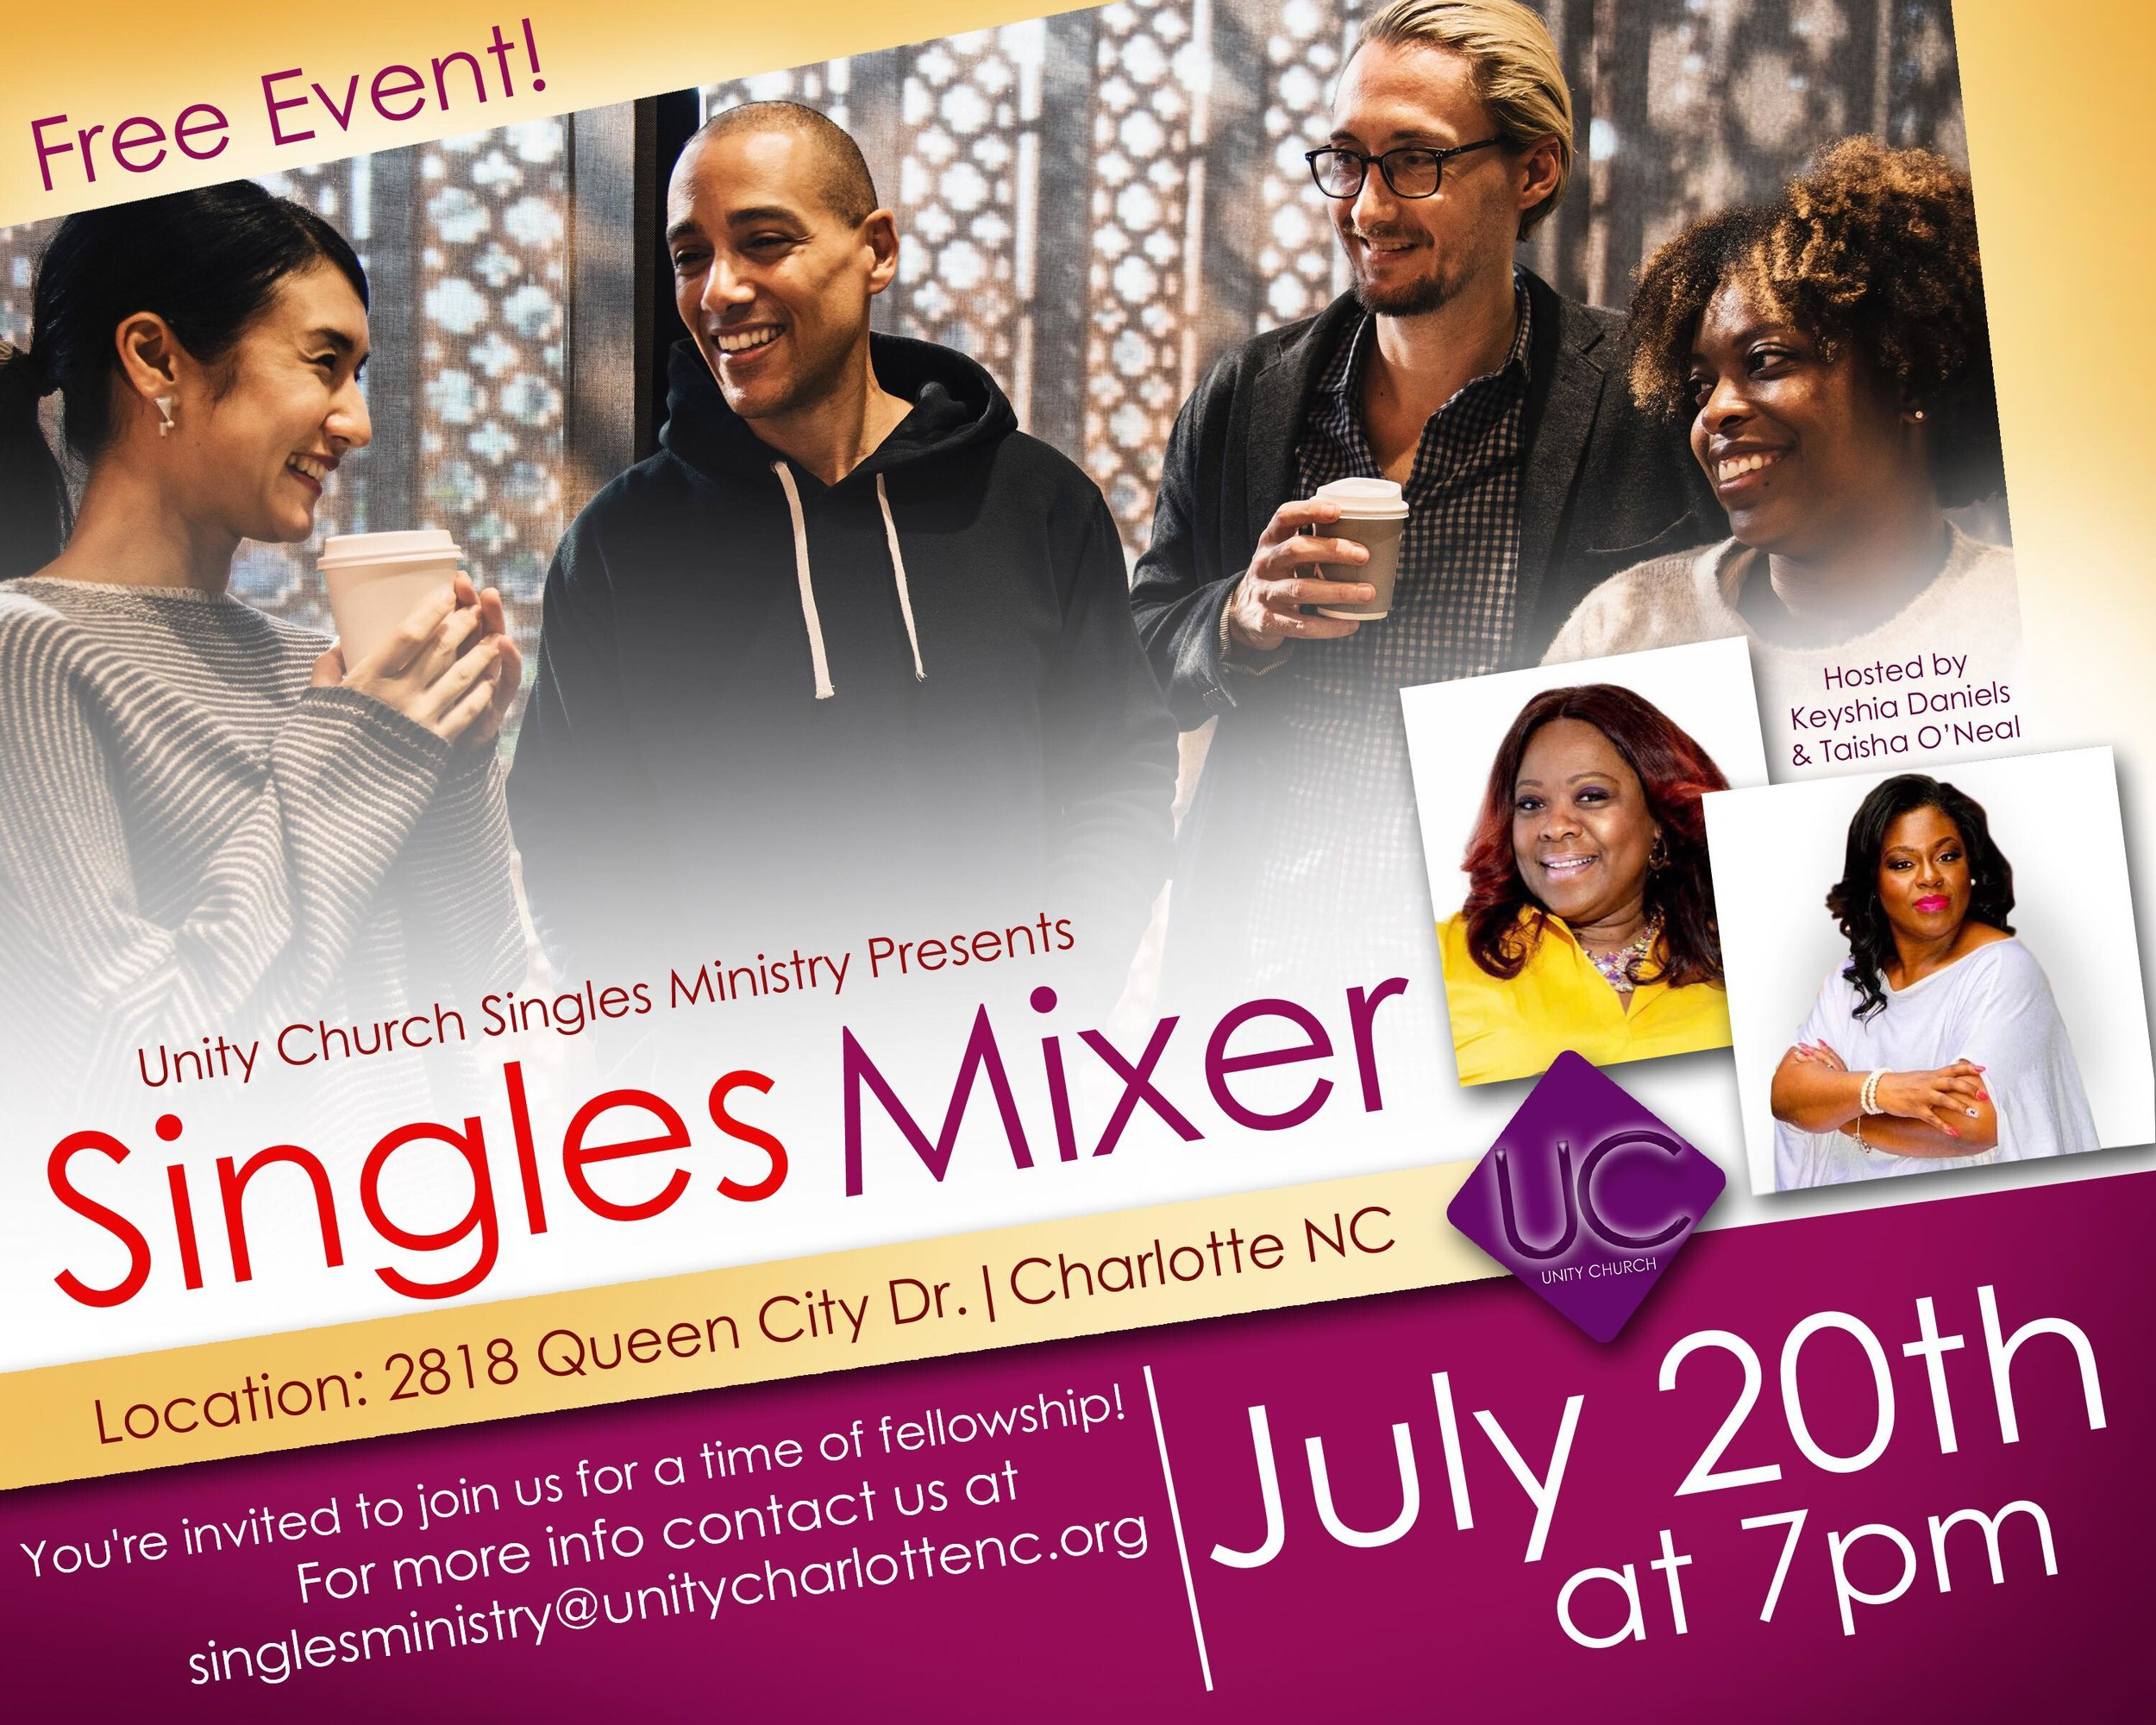 SinglesMixer-July.jpg